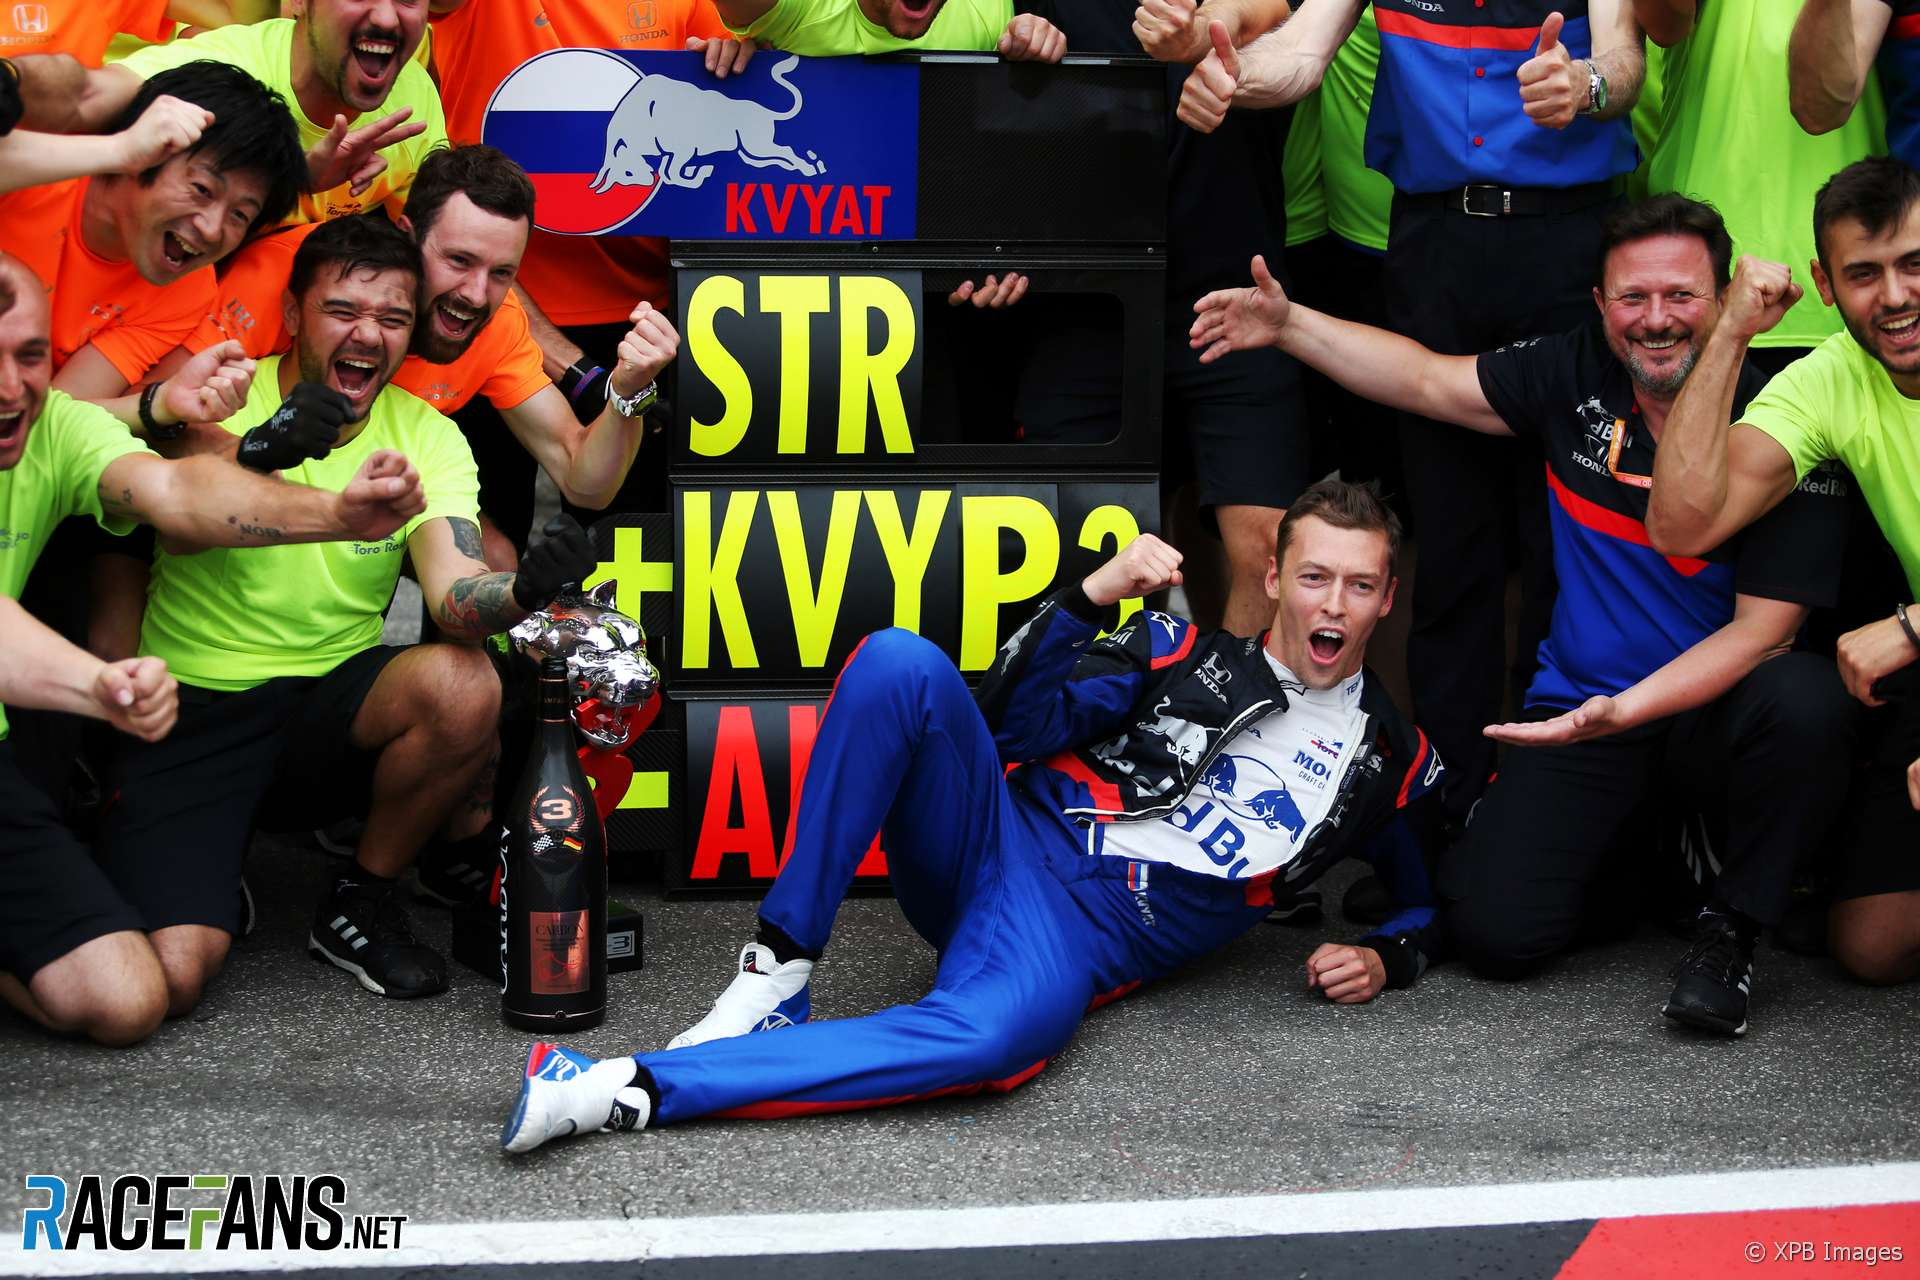 Daniil Kvyat, Toro Rosso, Hockenheimring, 2019